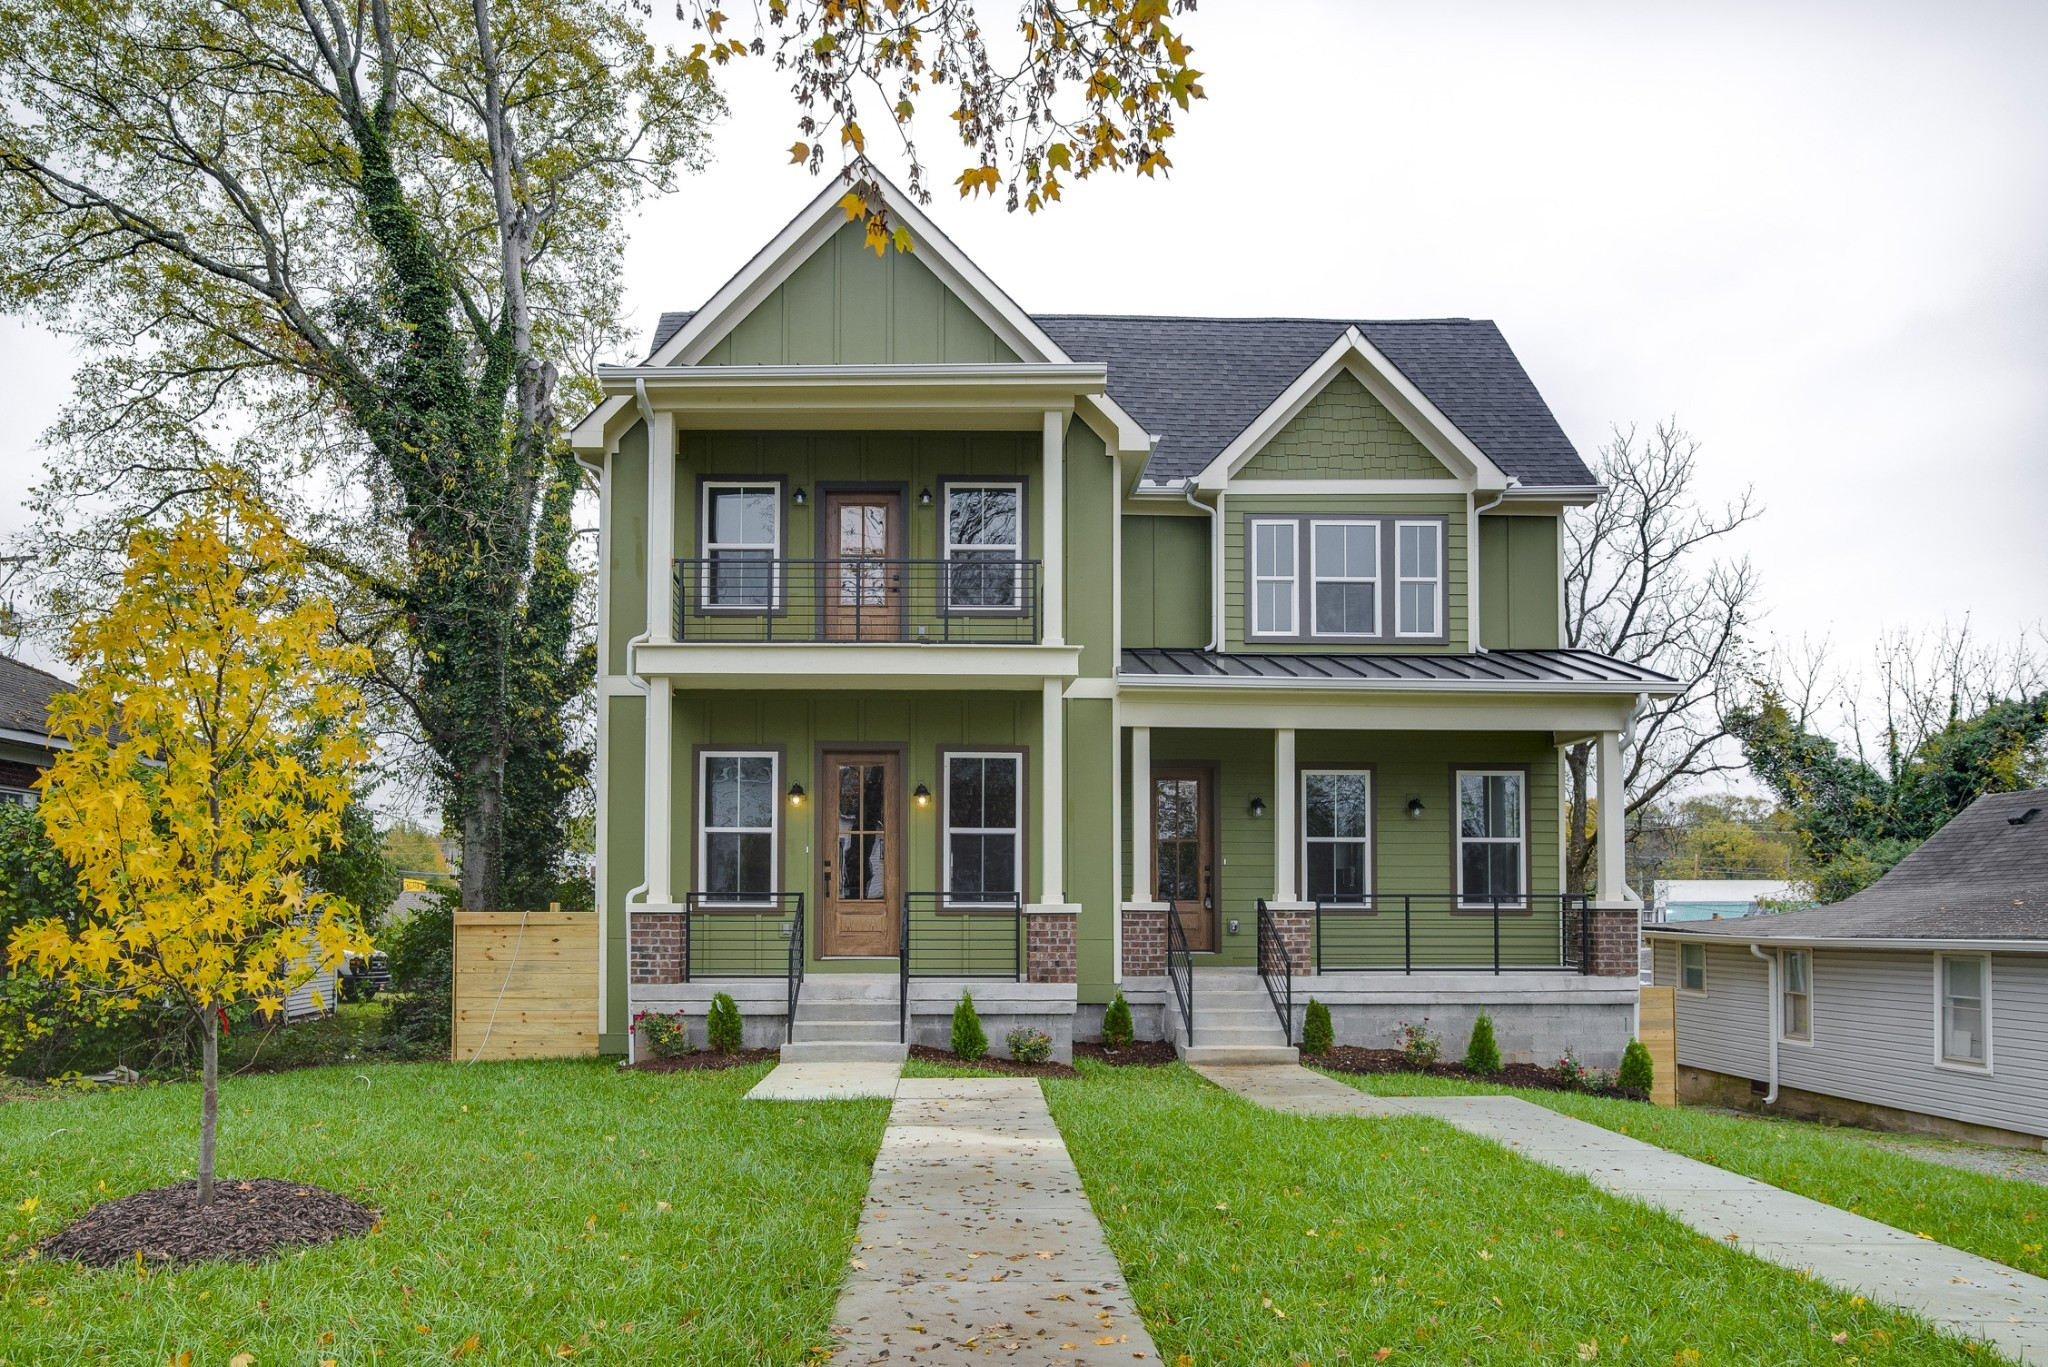 2510B Trevecca Ave, Nashville, TN 37206 - Nashville, TN real estate listing